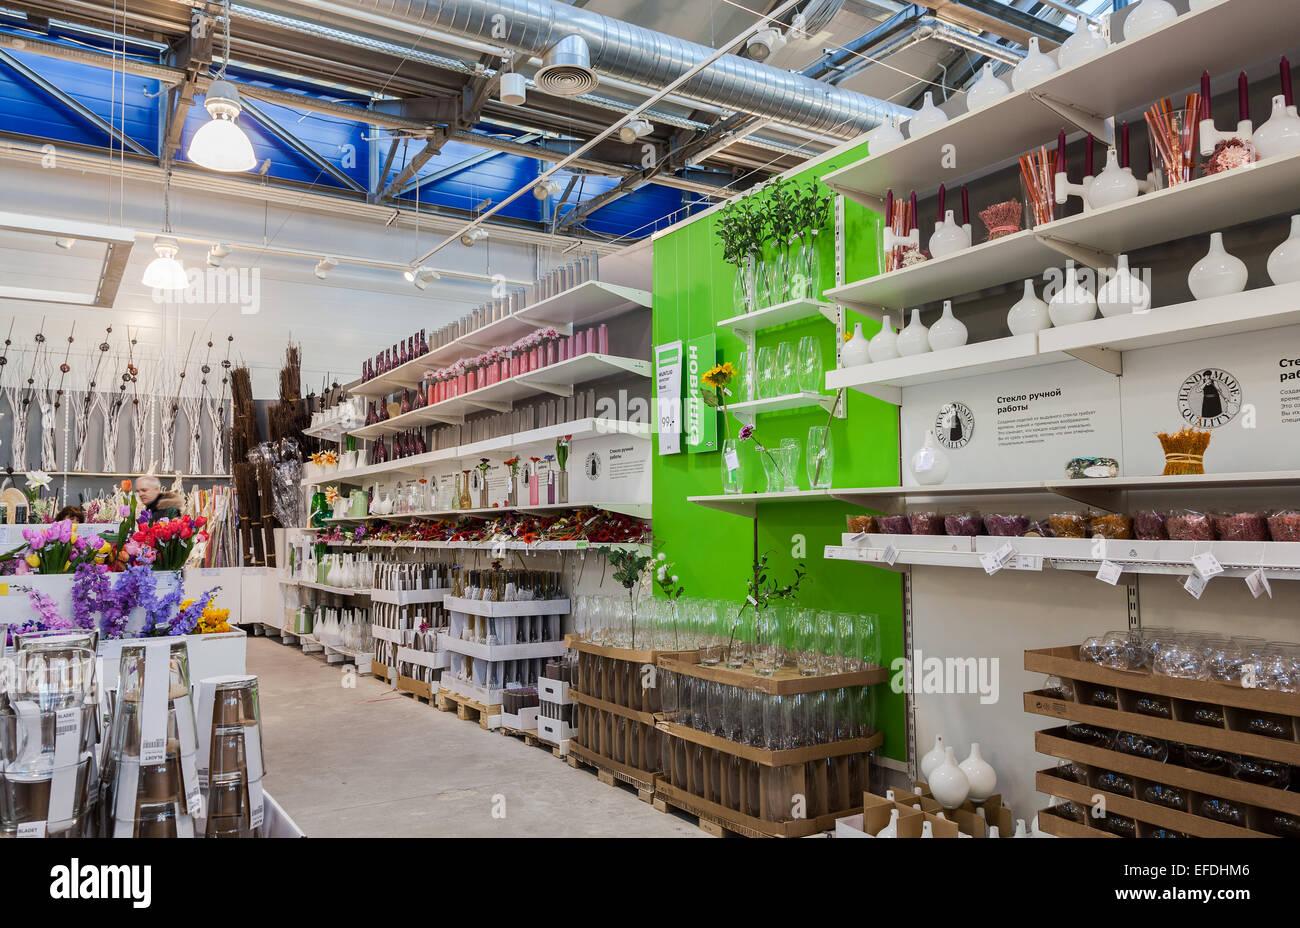 Interior Of The IKEA Samara Store. IKEA Is The Worldu0027s Largest Furniture  Retailer